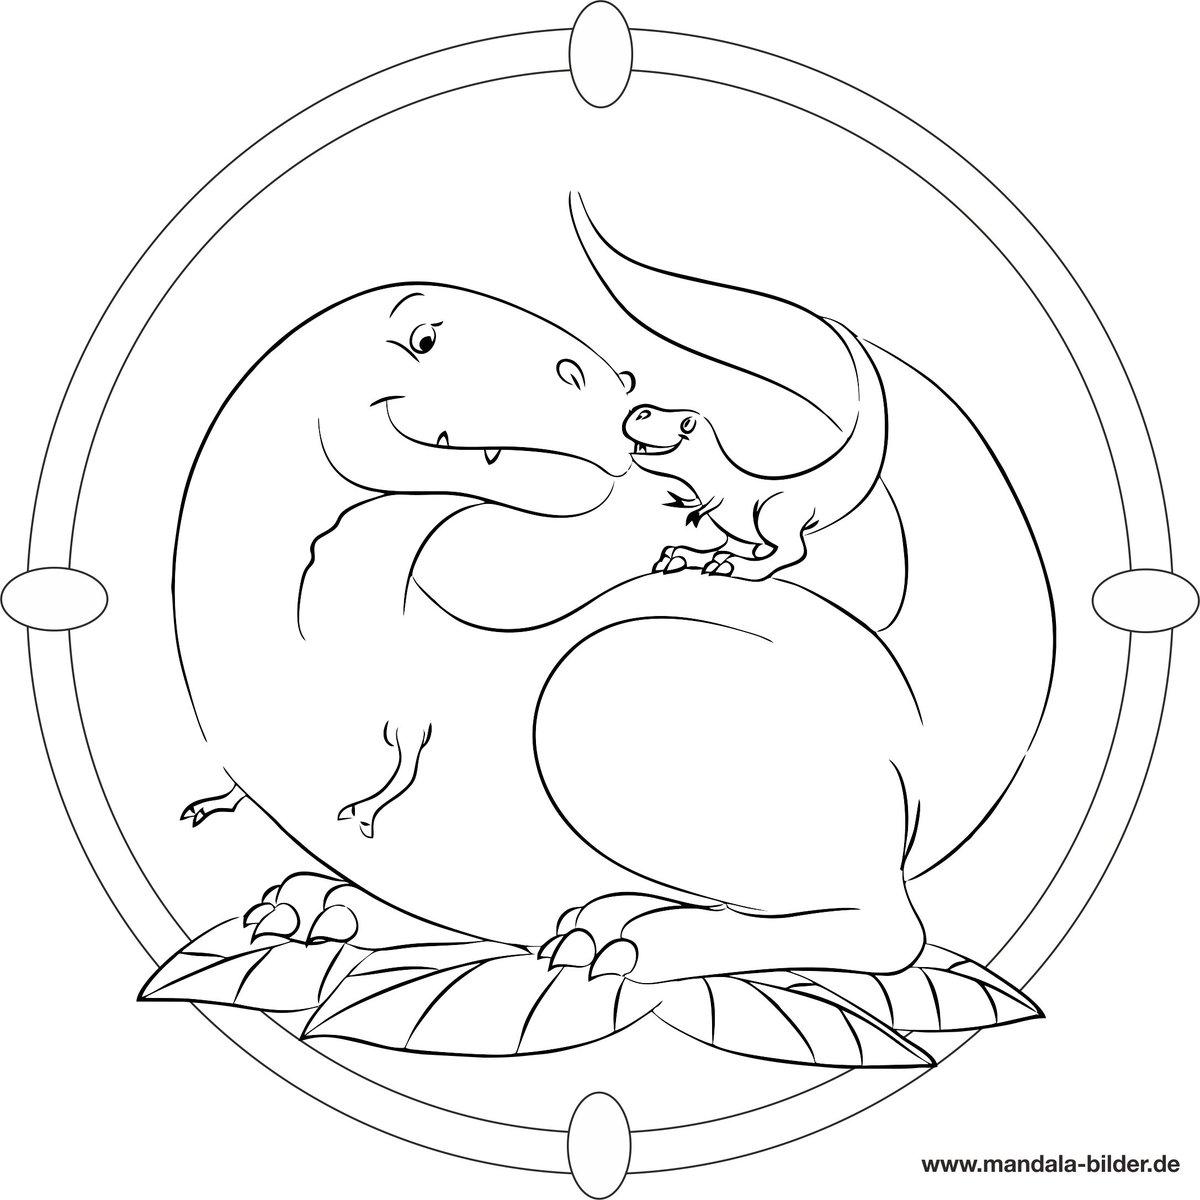 Dinosaurier Ausmalbilder Kostenlos Ausdrucken : Mandala Bilder Mandalabilder Twitter